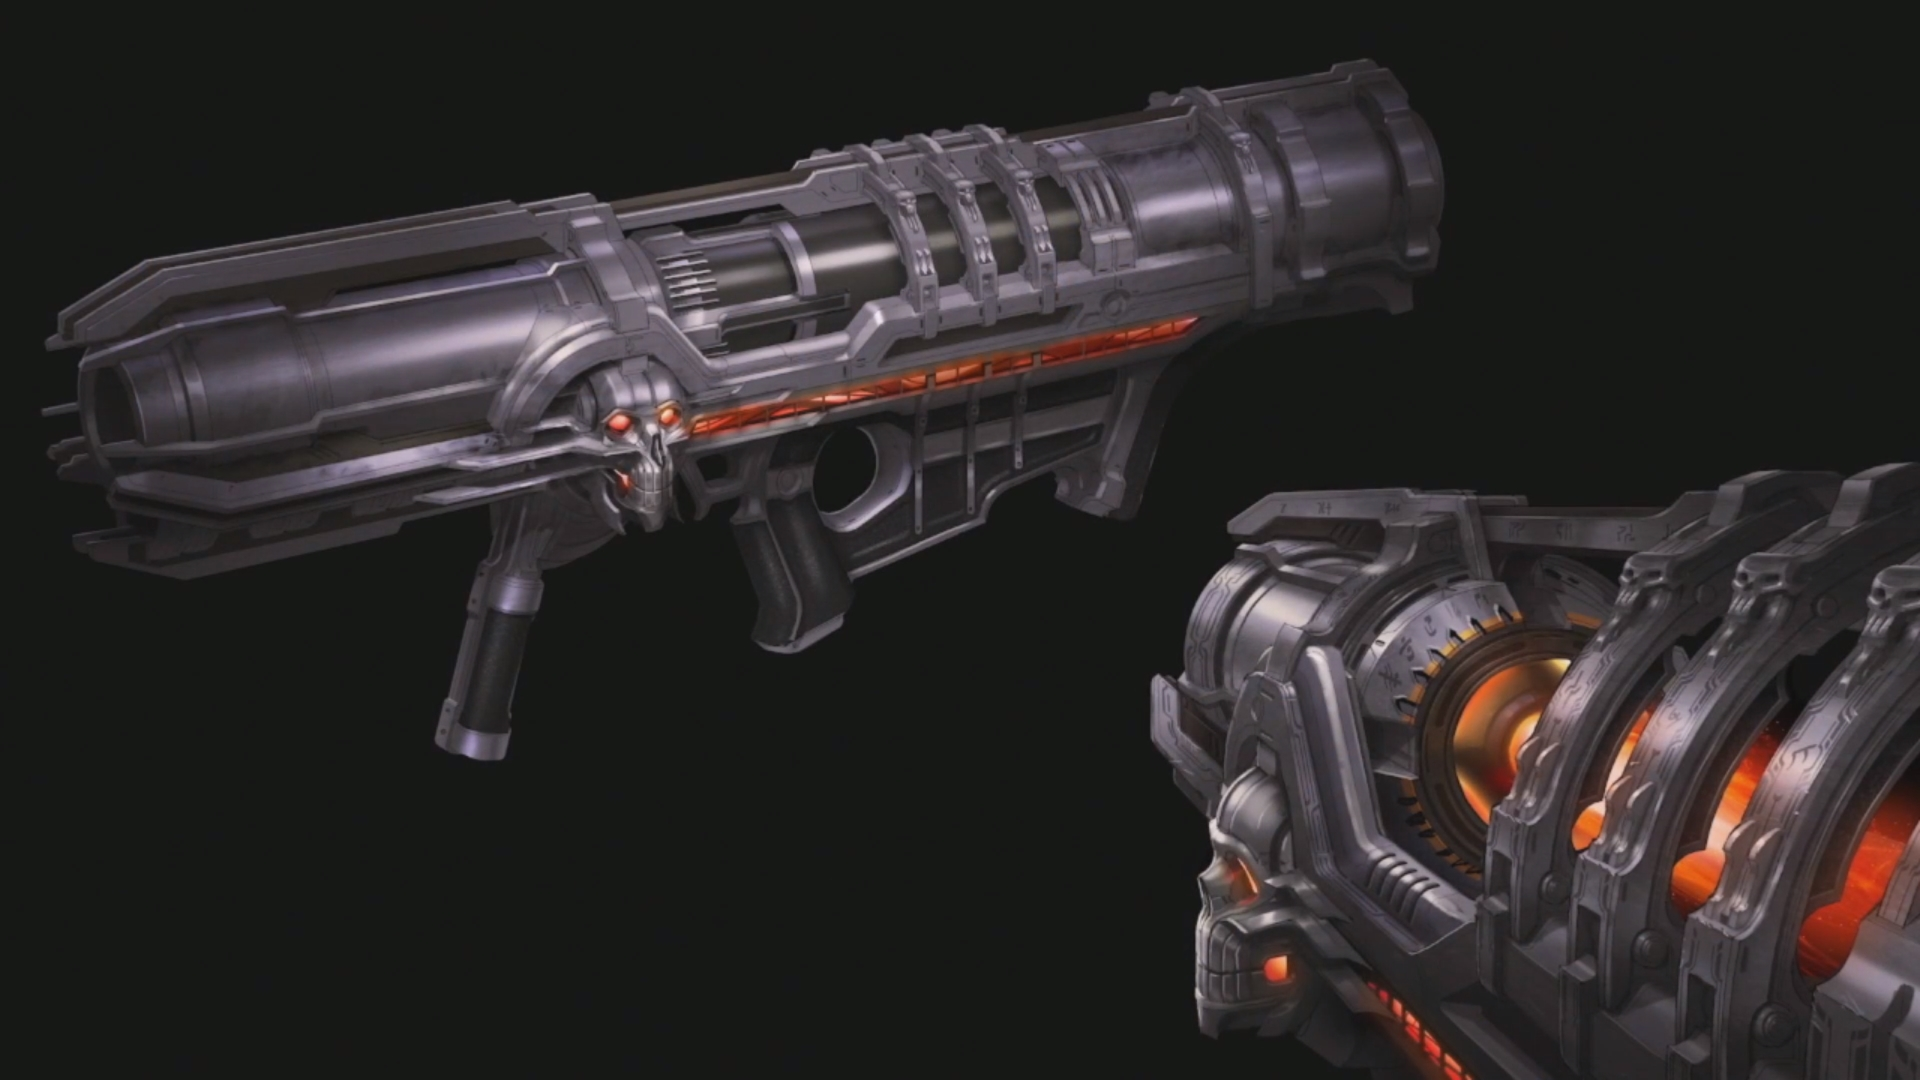 Doom-Slayer VS Cinder Fall The Prelude by METADANE on DeviantArt